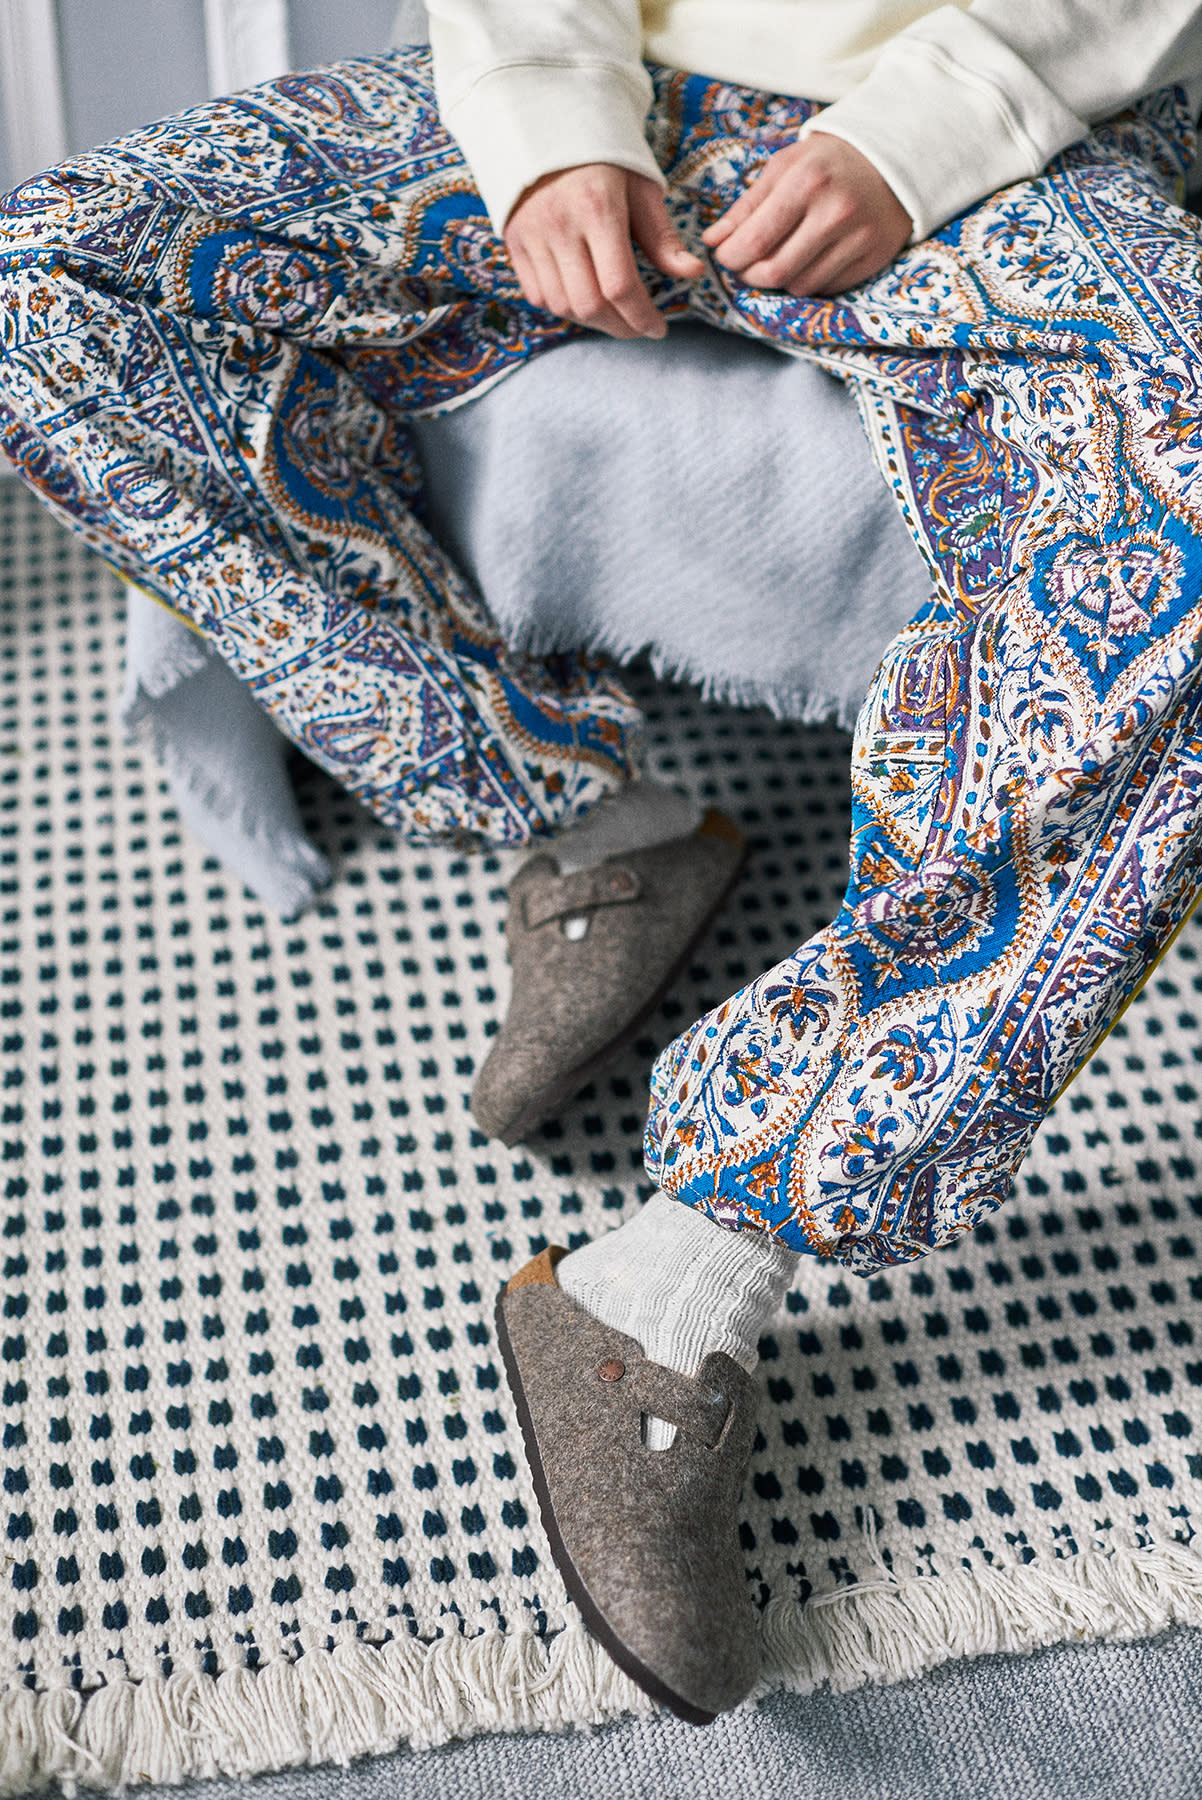 Home Body| END. SS20 Editorial .02 model wears Paria Farzaneh and Birkenstock